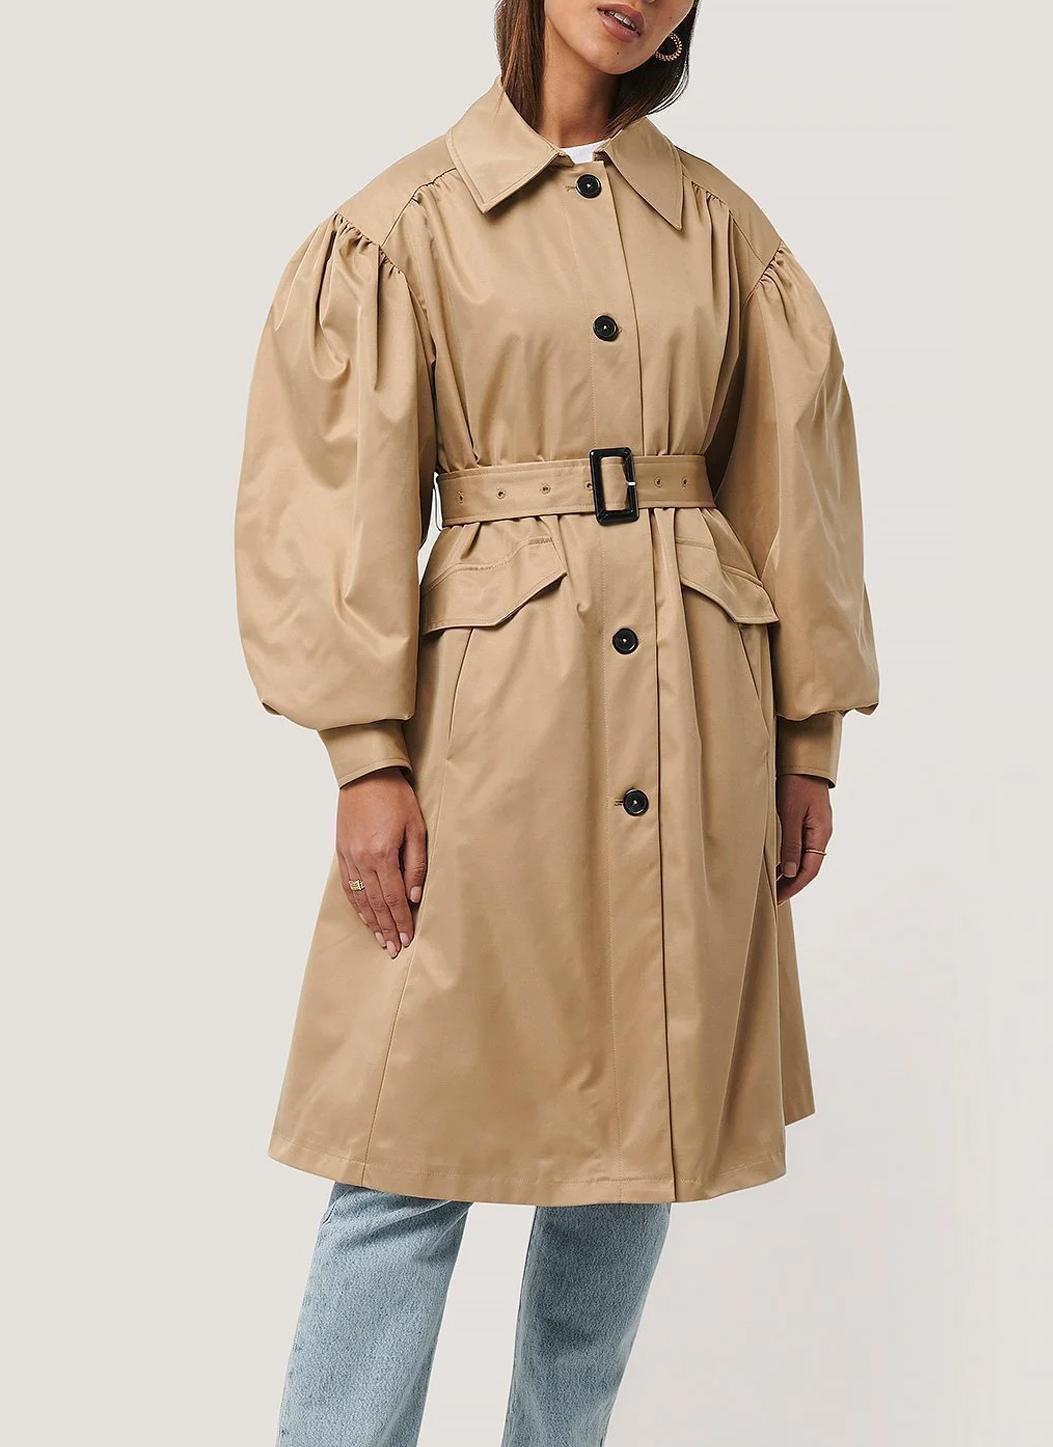 balloon sleeve trench coat 2021